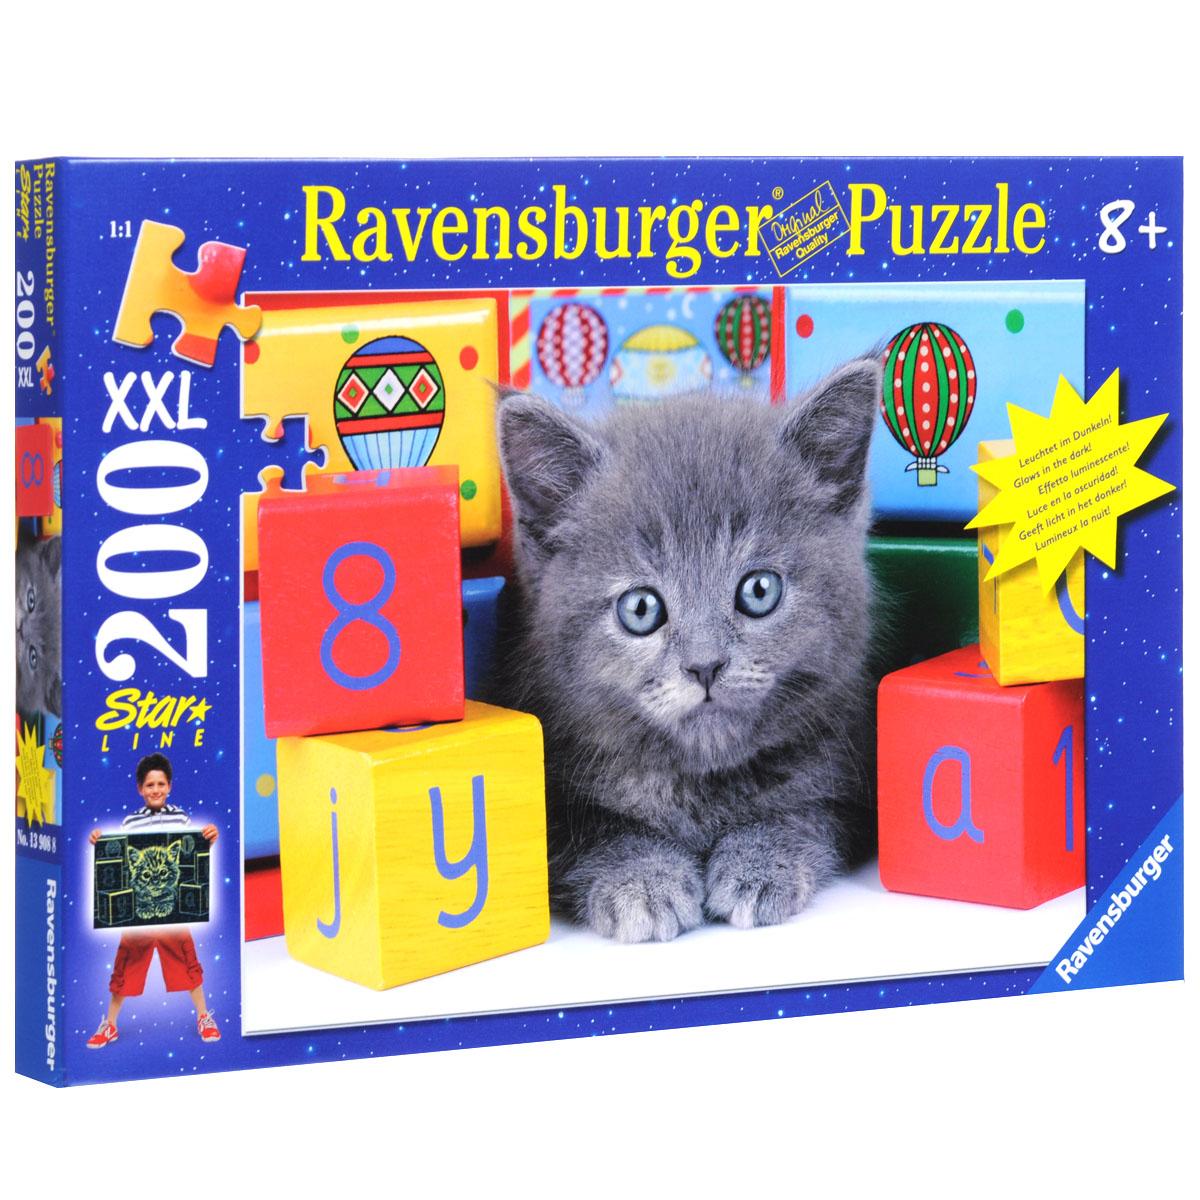 Ravensburger Котенок с кубиками. Пазл XXL, 200 элементов